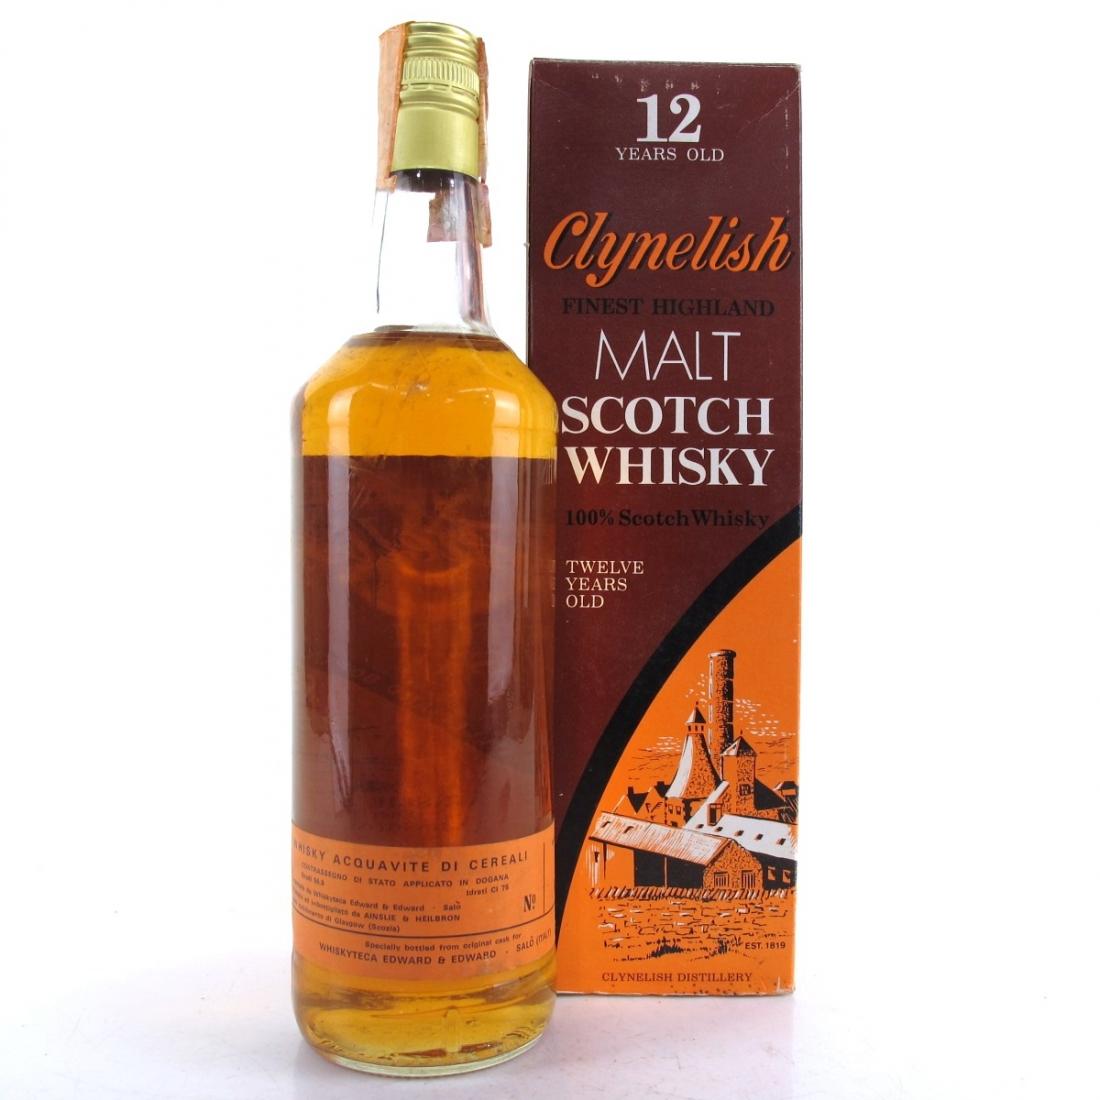 Clynelish 12 Year Old Ainslie and Heilbron Full Proof / Edward & Edward Import